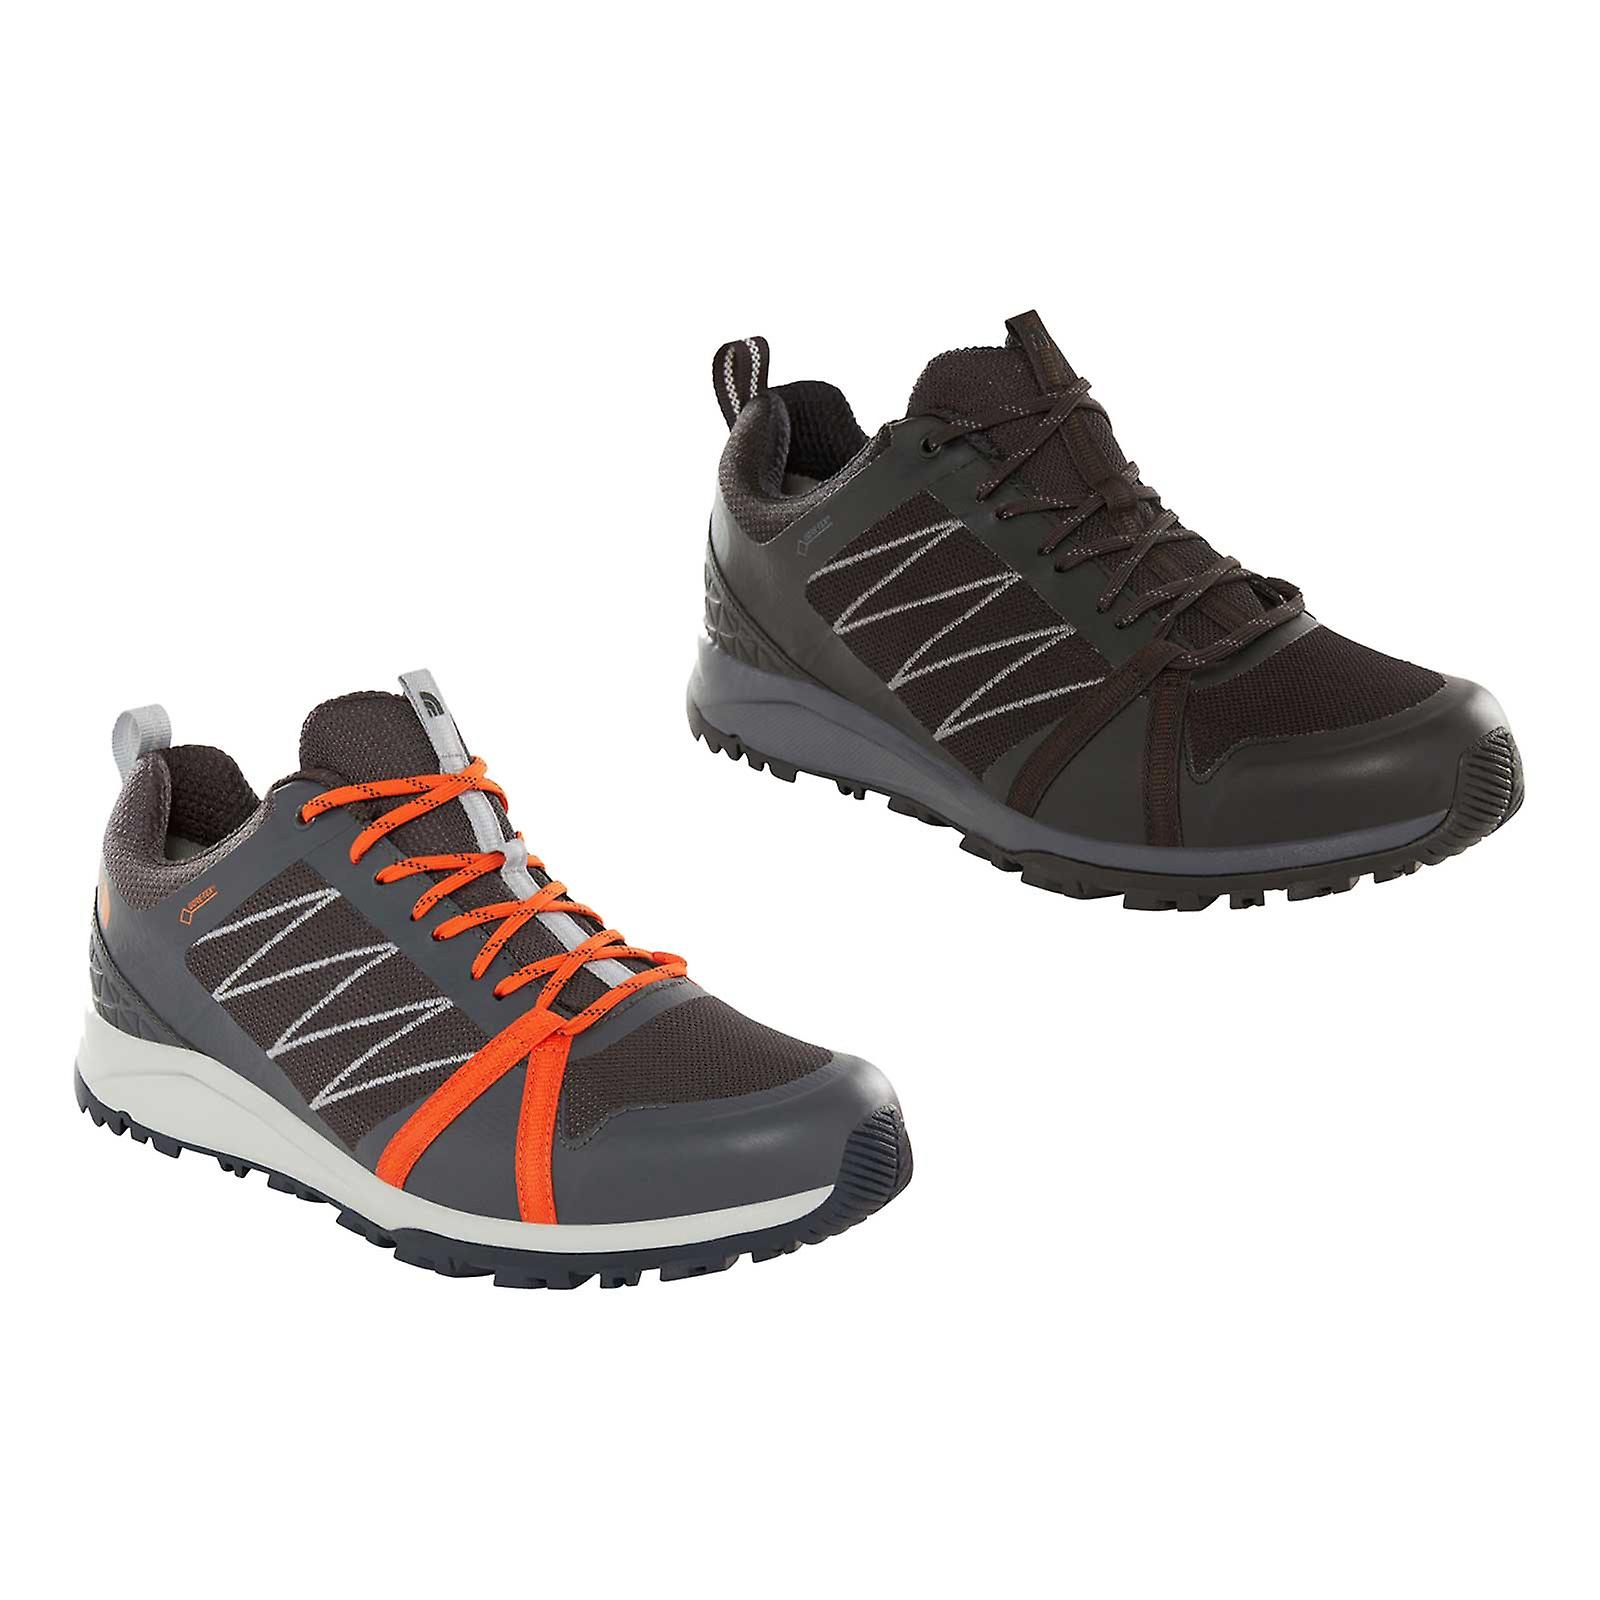 La North Face Mens LW Fastpack II Gtx chaussure